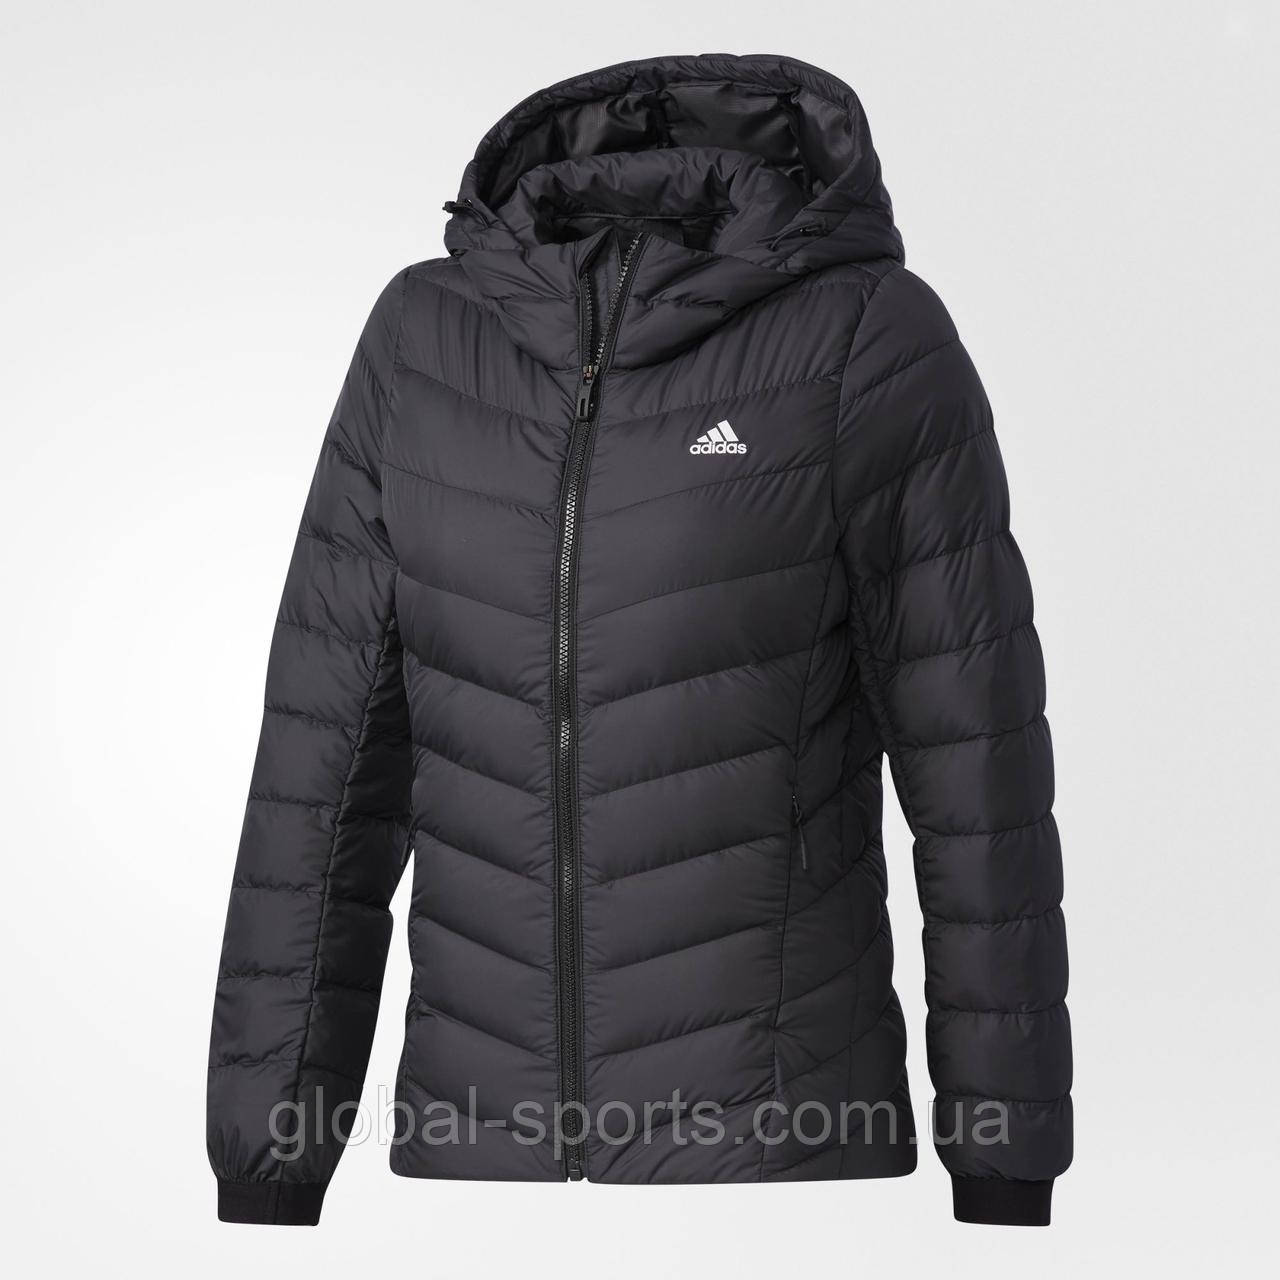 Женский пуховик Adidas Terrex Climawarm(Артикул:BQ8778)